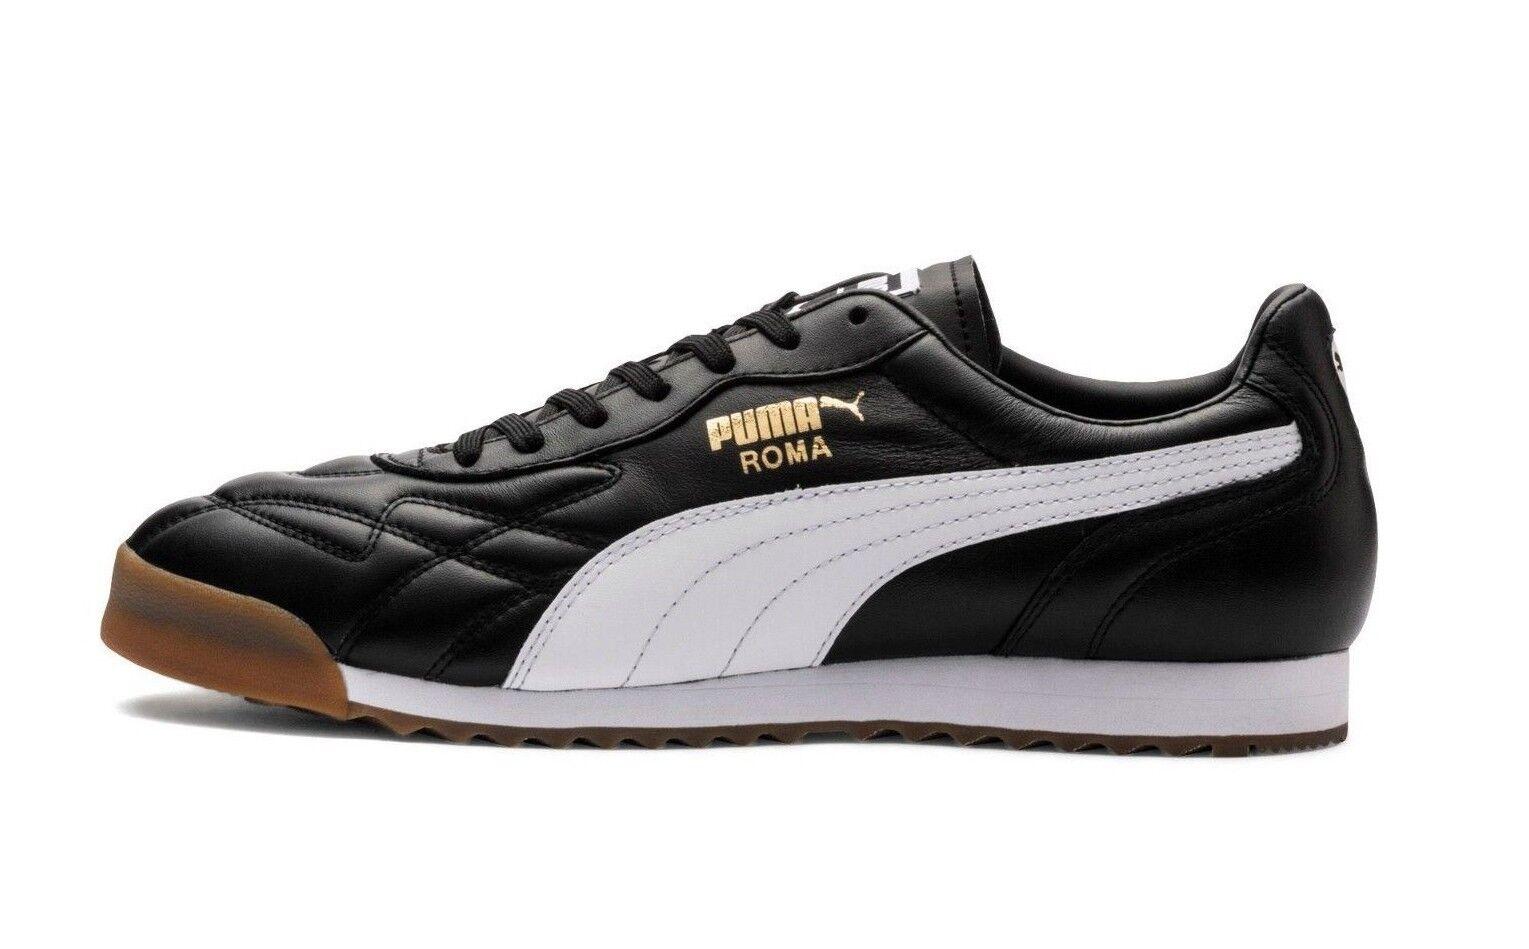 Zapatos  para hombre ROMA C ANNIVERSARIO Puma Negro/Blanco 36667301 C ROMA e0b4ea